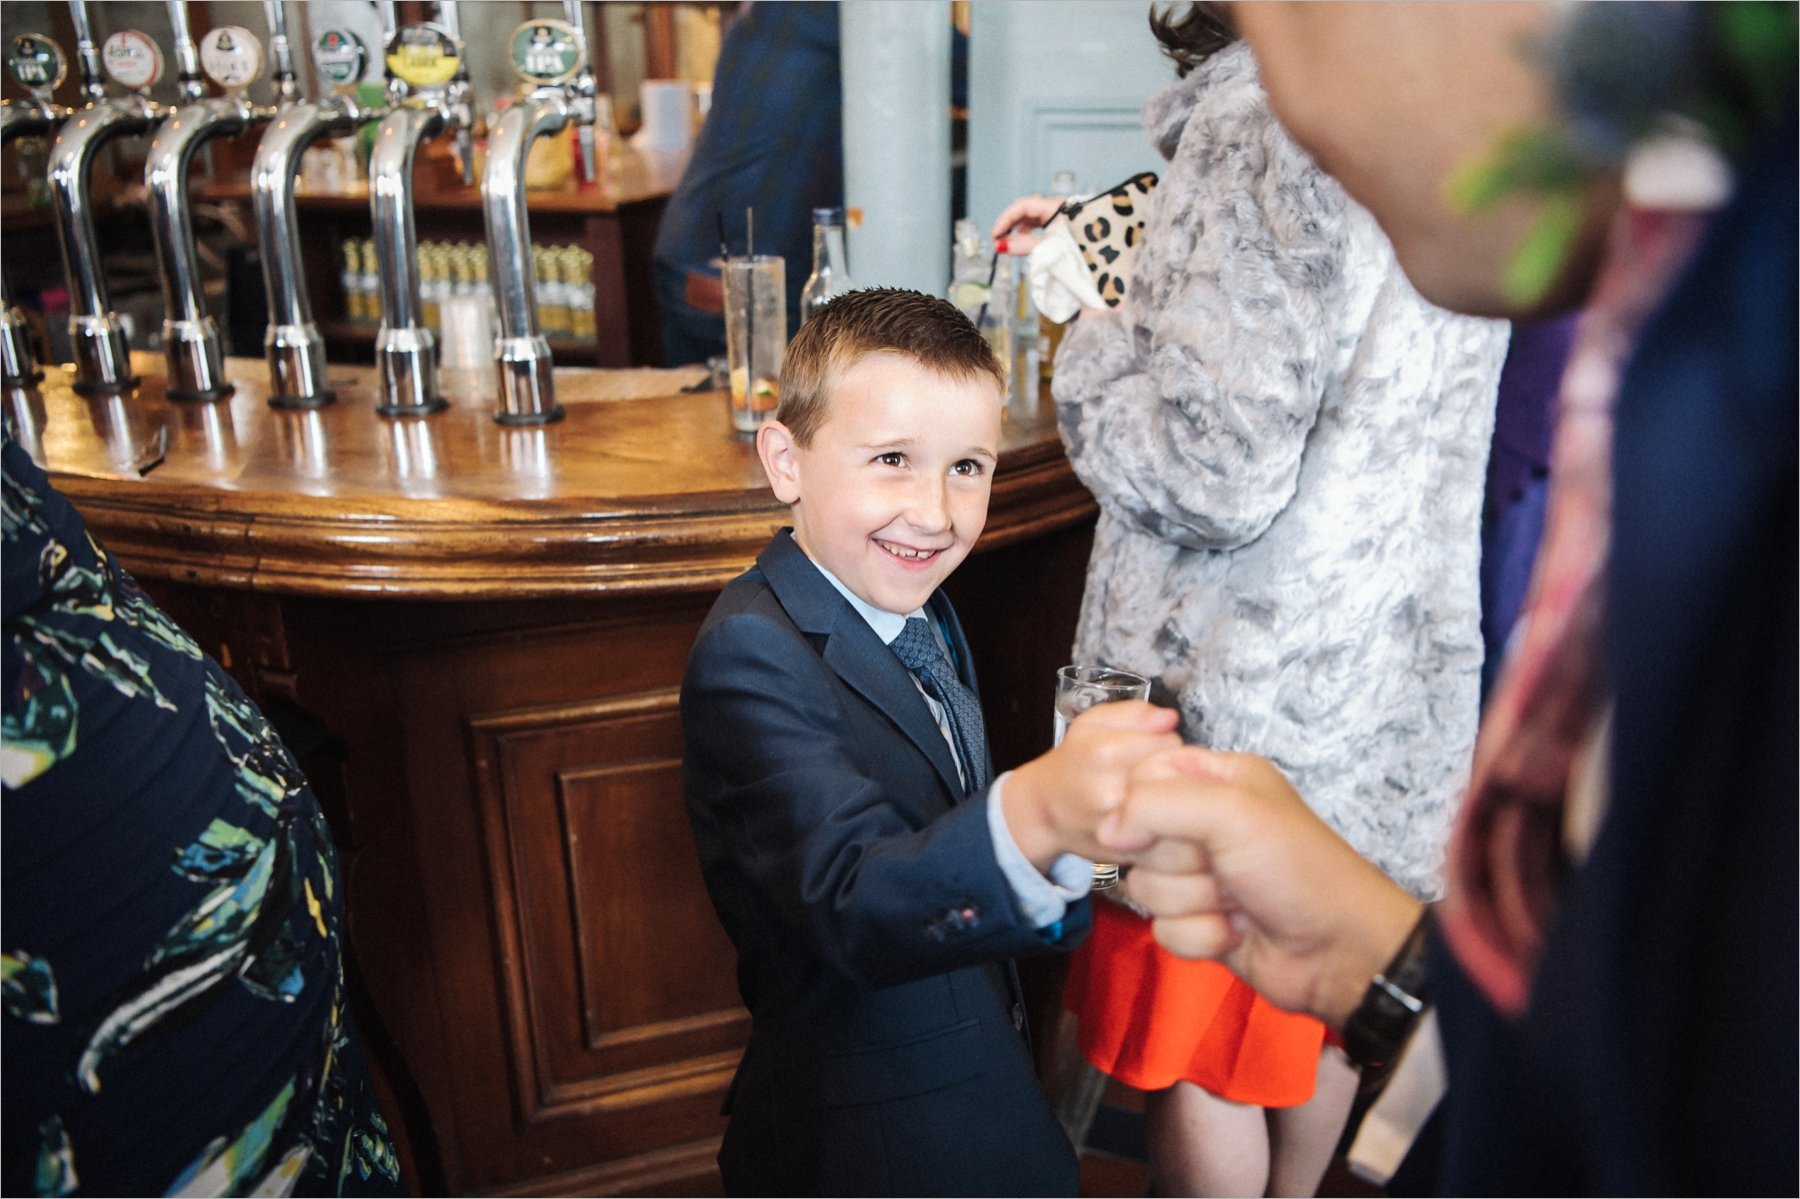 a fist bump with the groom